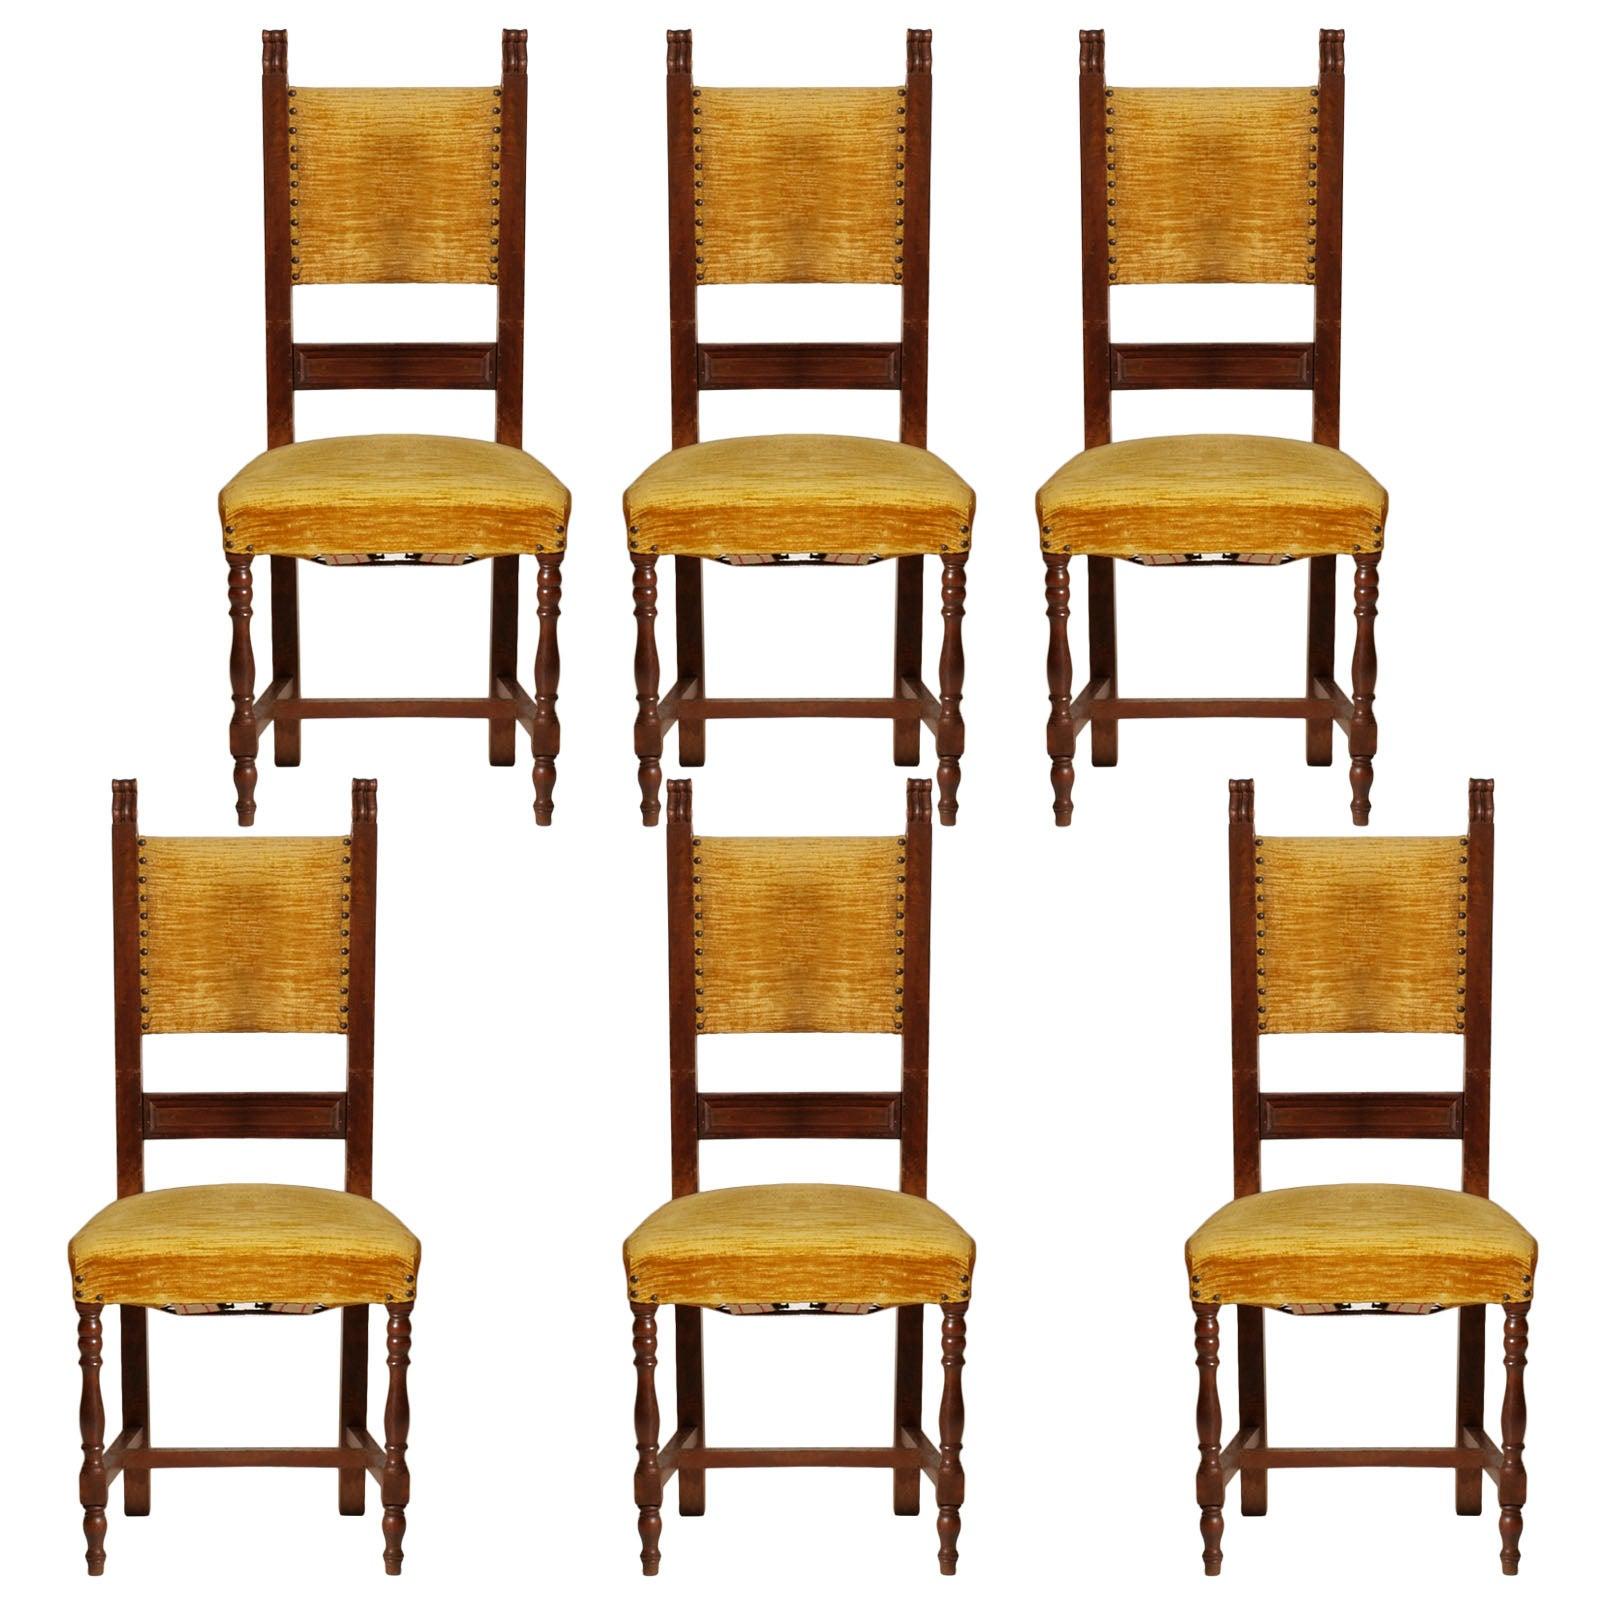 Early 20th Century Italian Set Six Renaissance Chairs in Walnut Wax-Polished